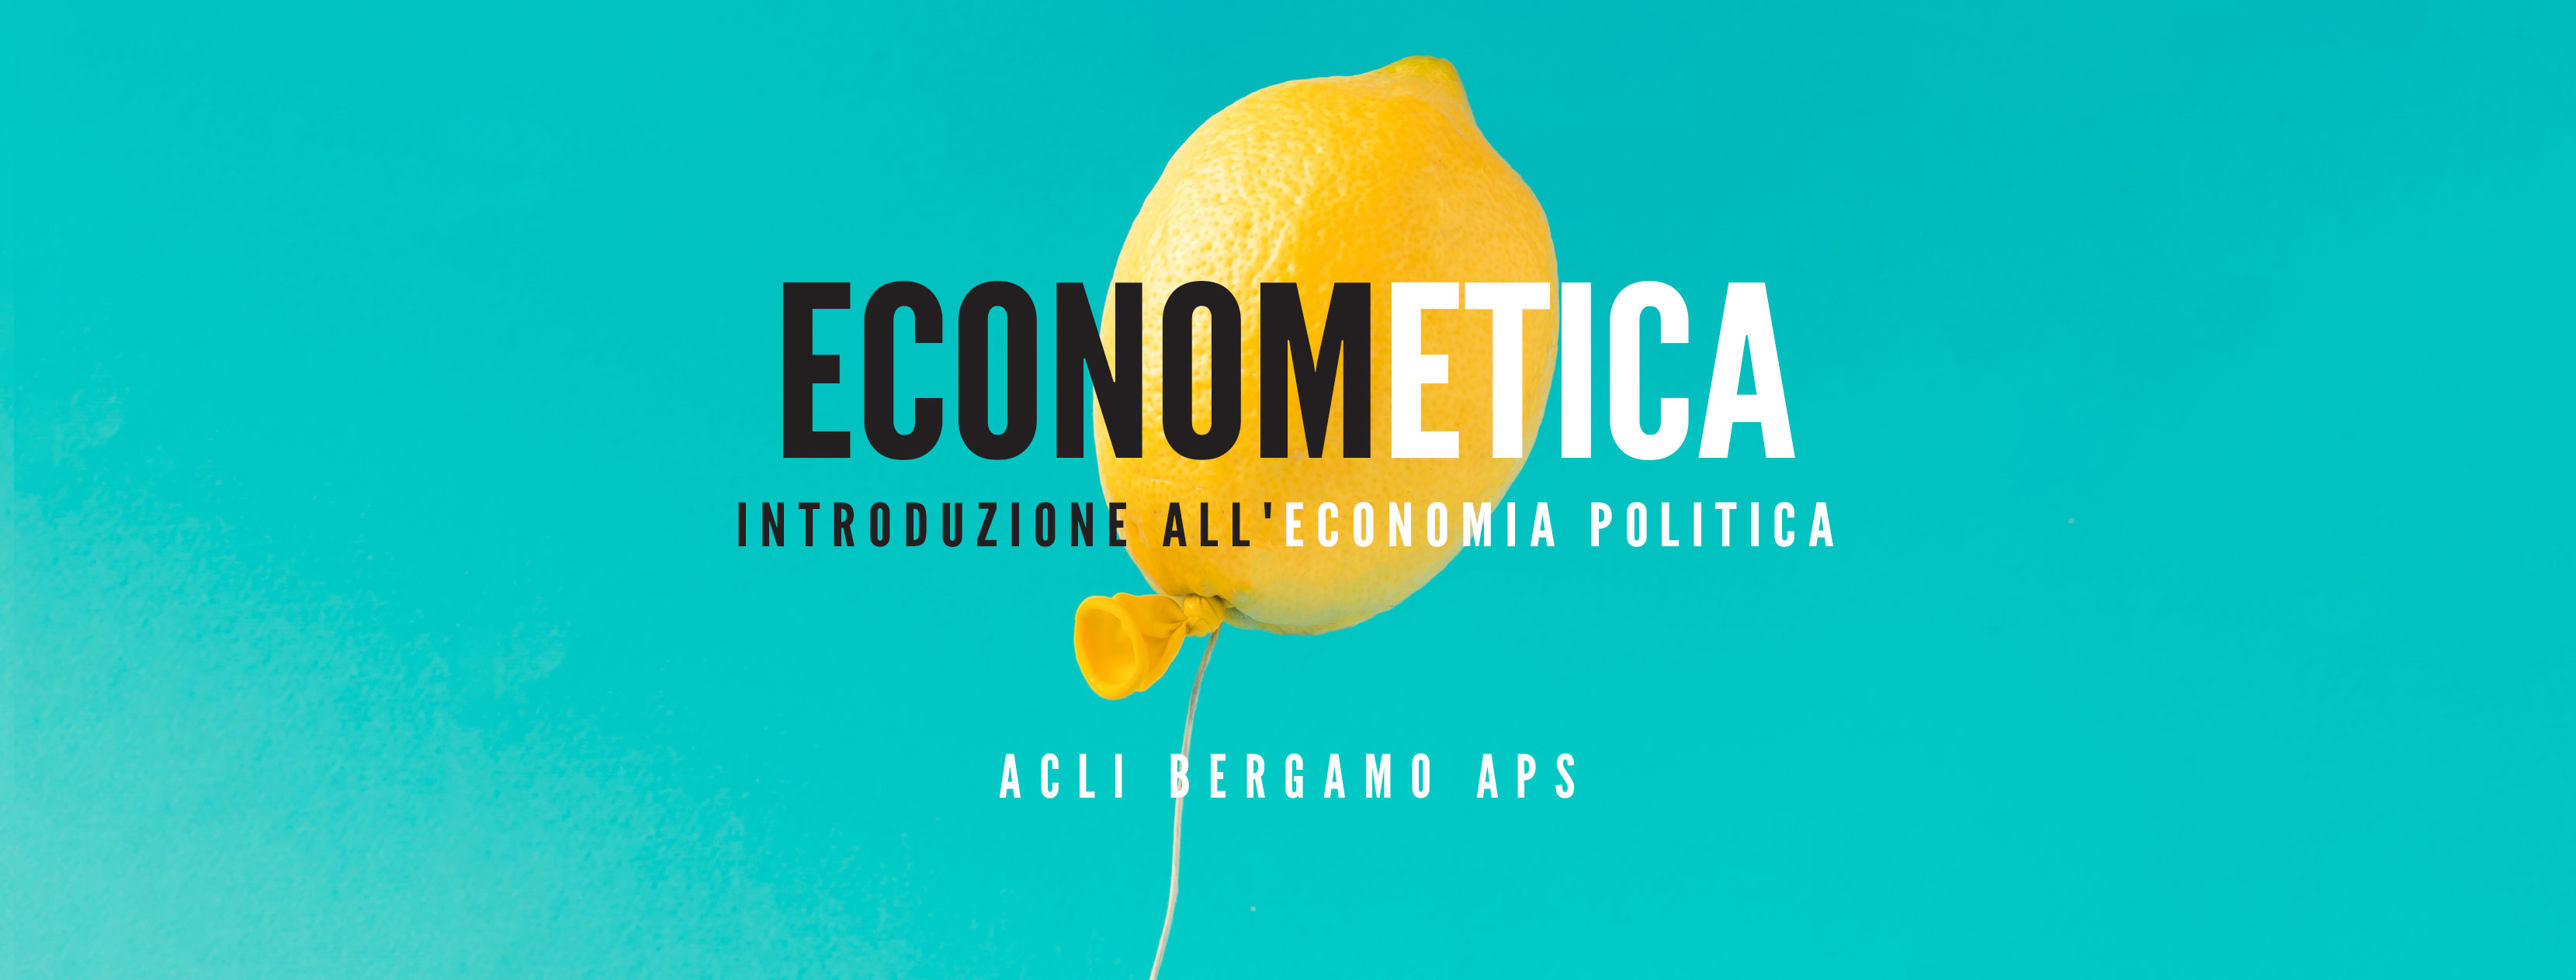 Econometica